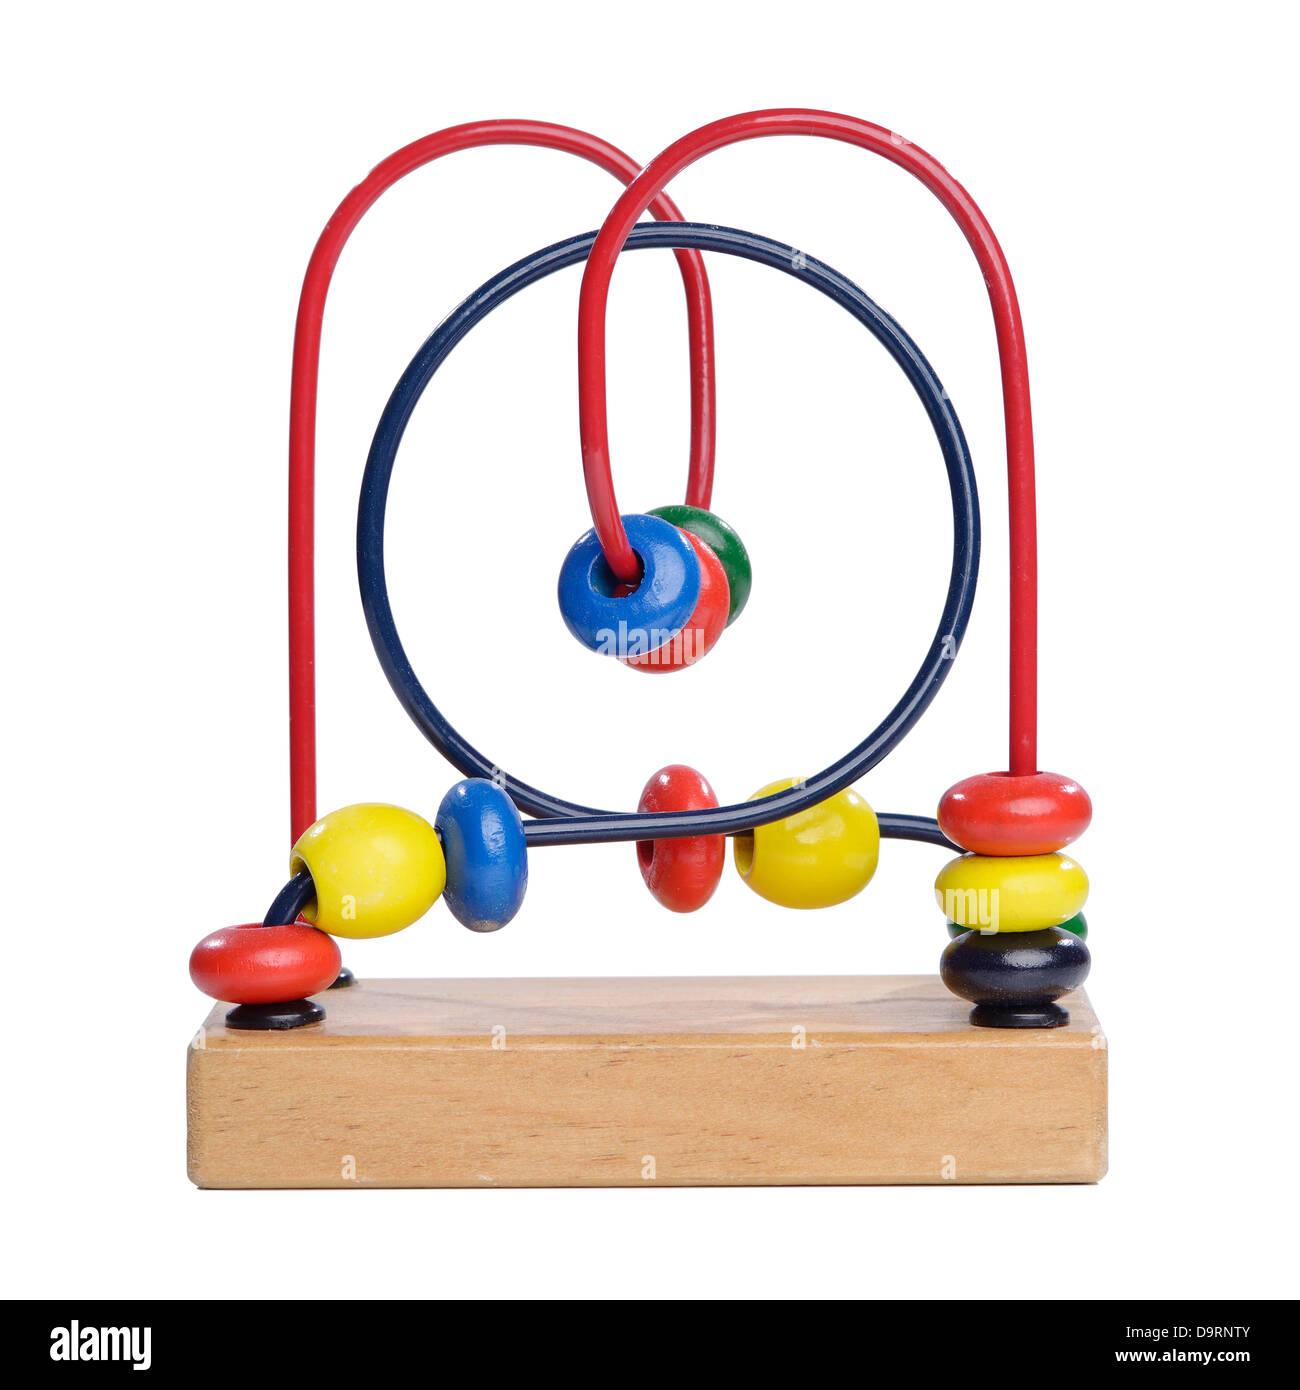 Holzperle Labyrinth Spielzeug Stockbild